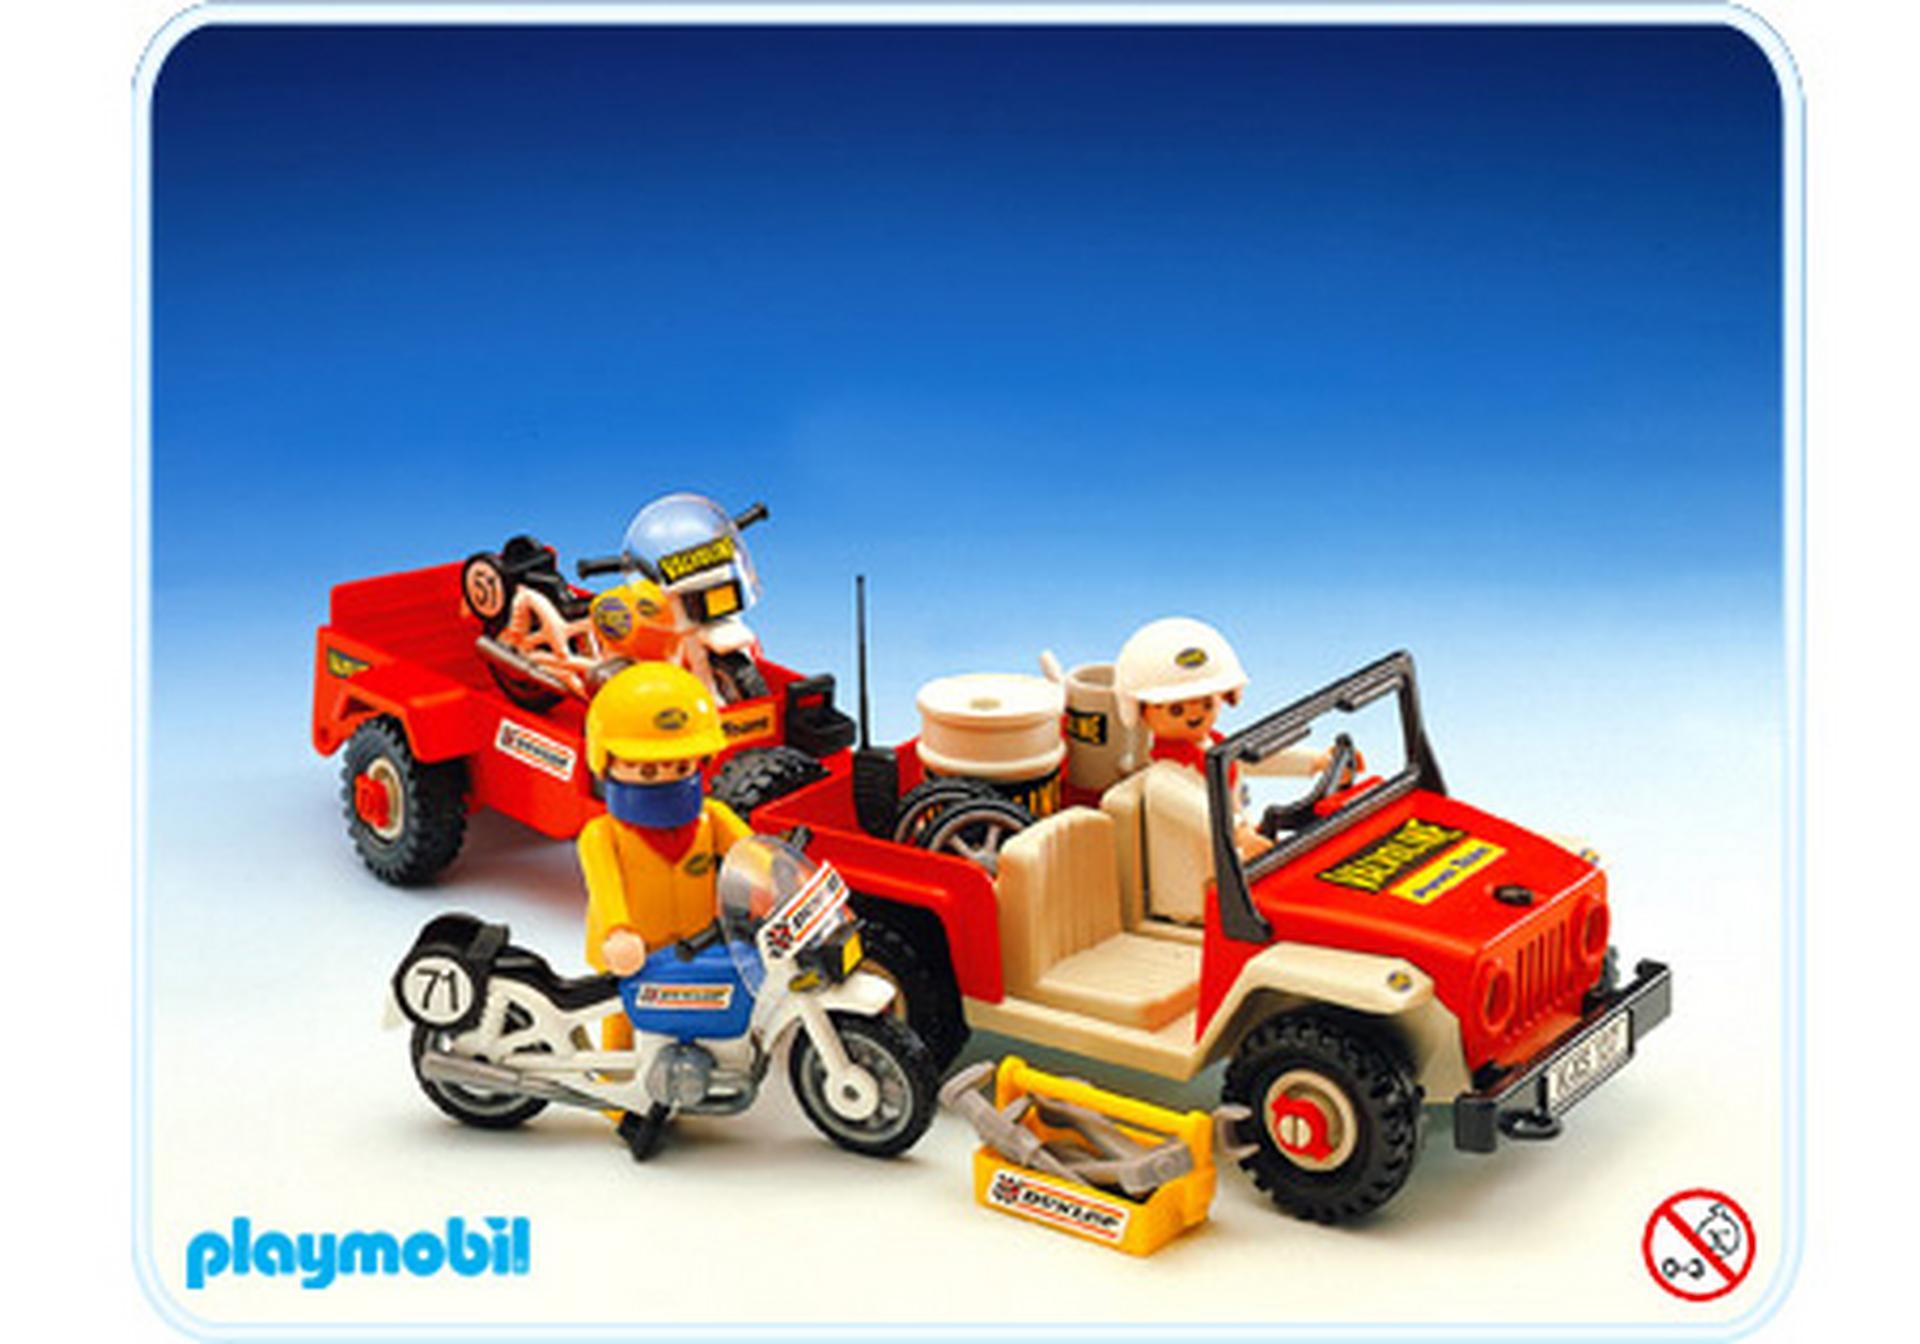 Gel ndewagen motorradanh nger 3478 a playmobil for Jugendzimmer playmobil